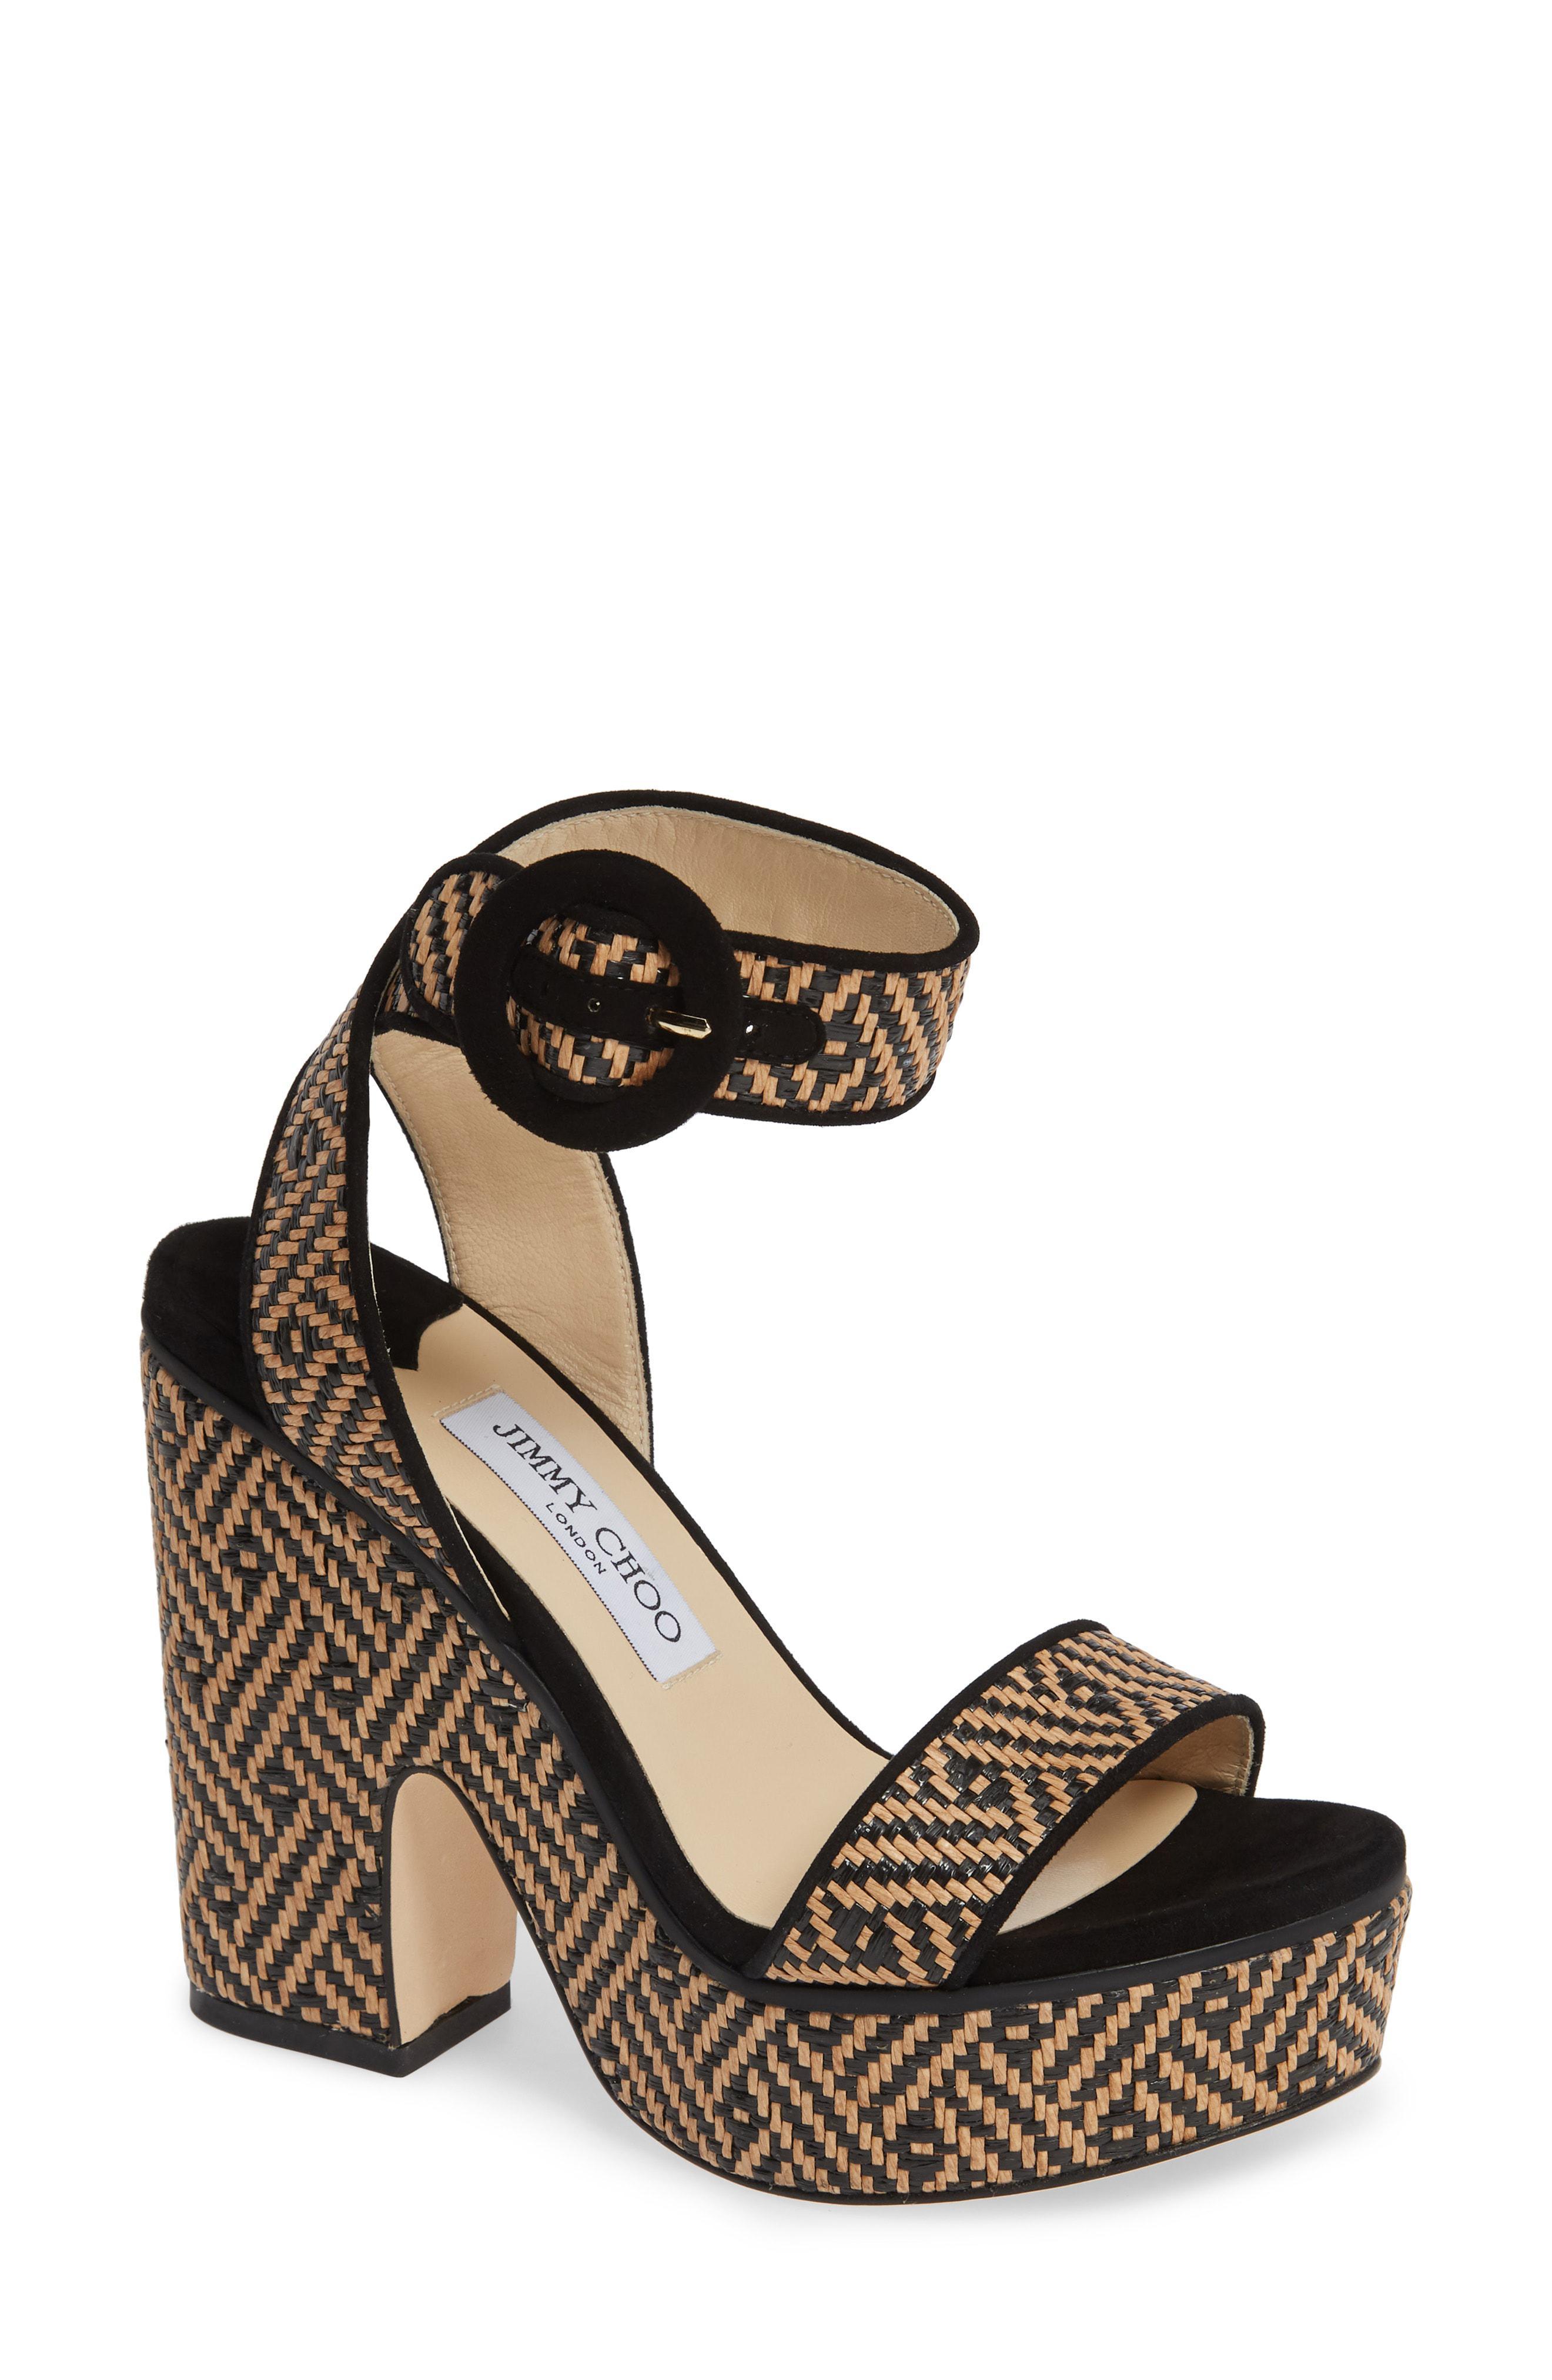 1d3af5b1d8c692 Jimmy Choo - Black Aimee Platform Ankle Strap Sandal - Lyst. View fullscreen